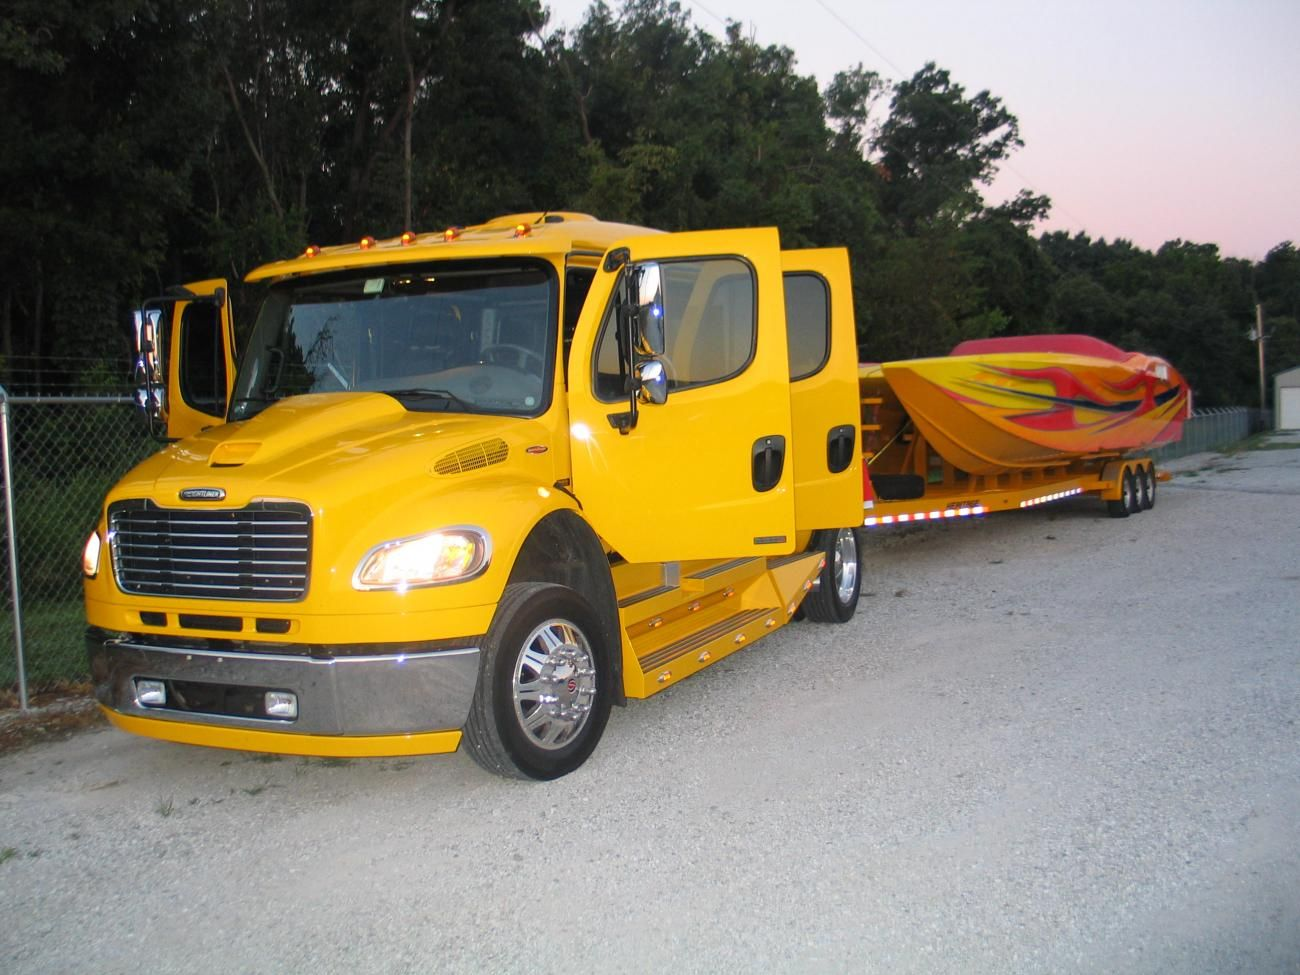 Luxury Toy Haulers Toy Hauler Sport Truck Suv